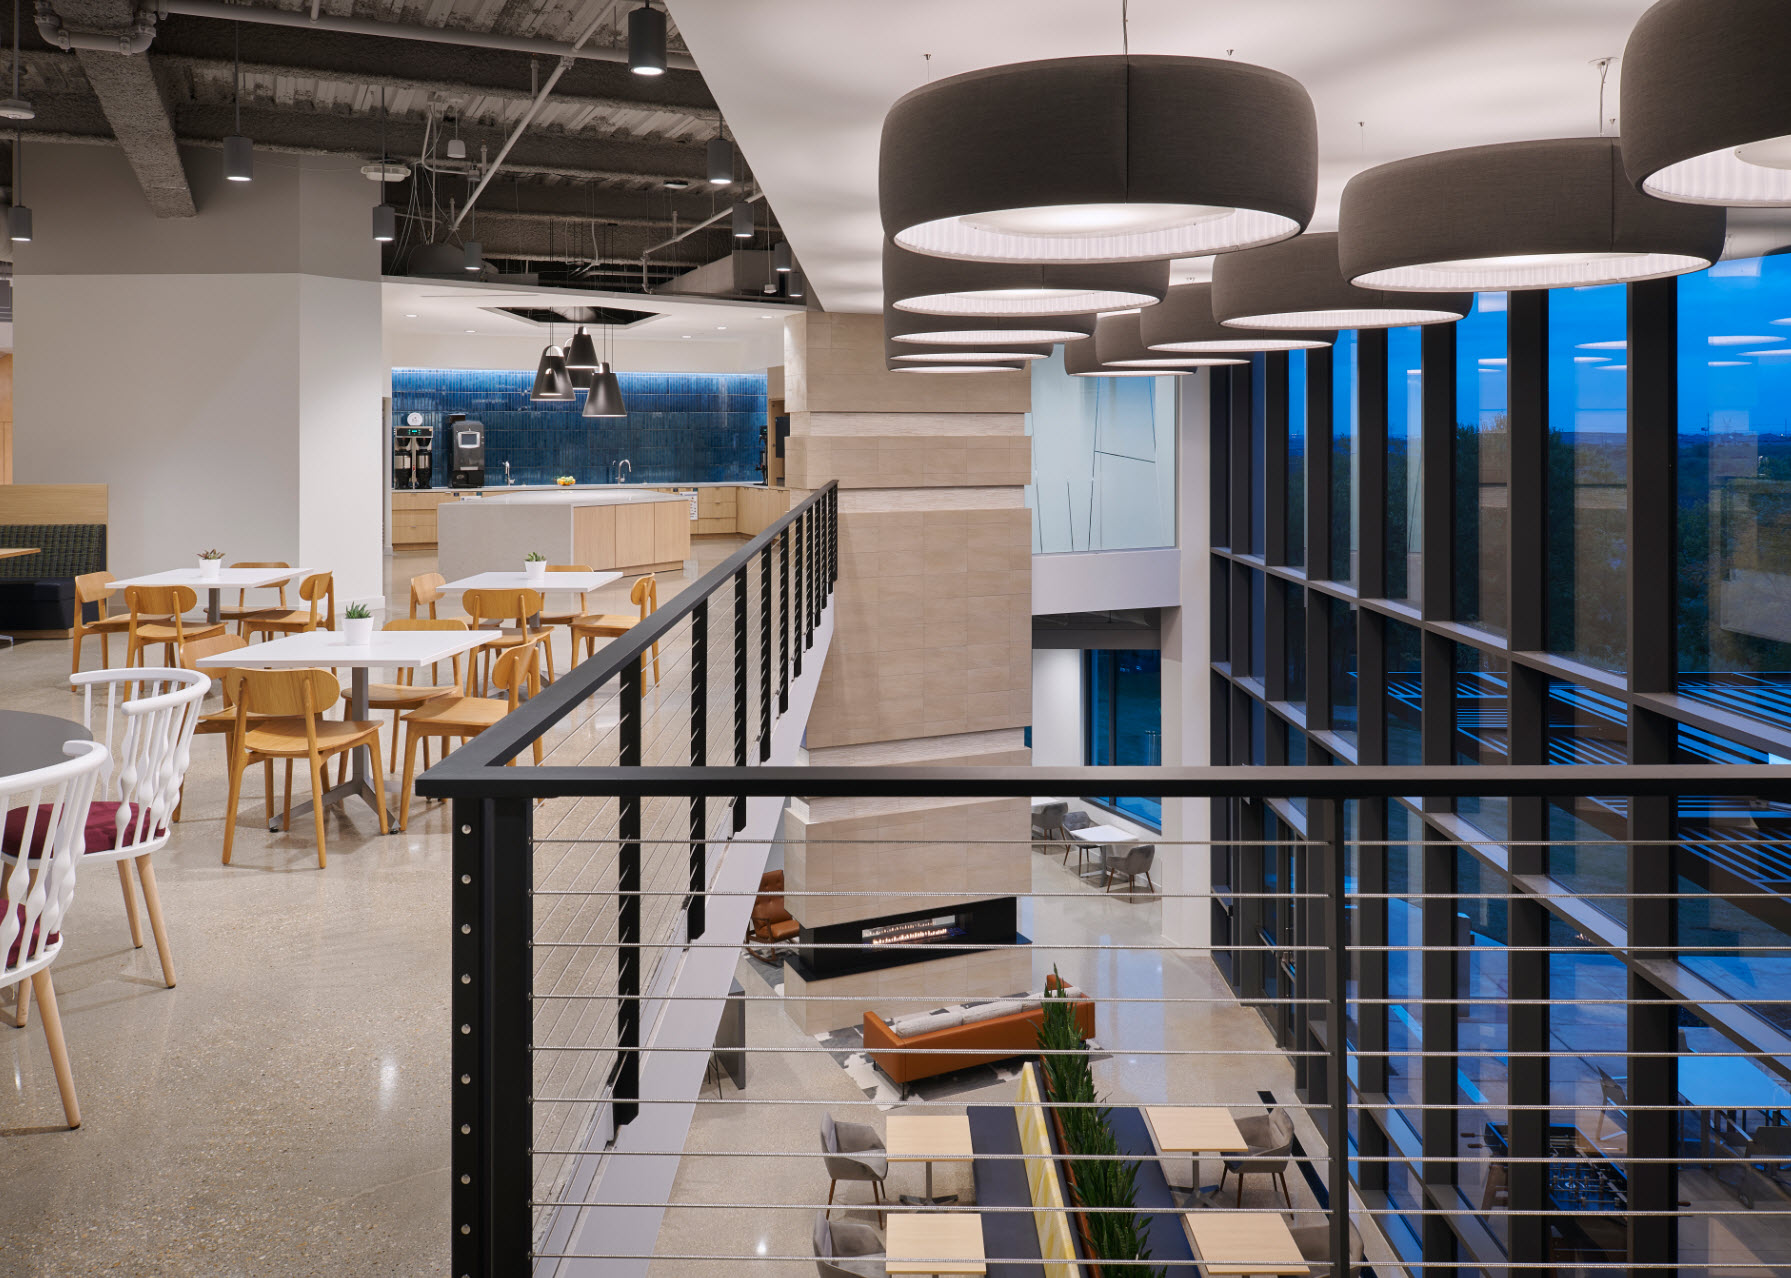 Office Mezzanine with Keuka Studios Cable Railing